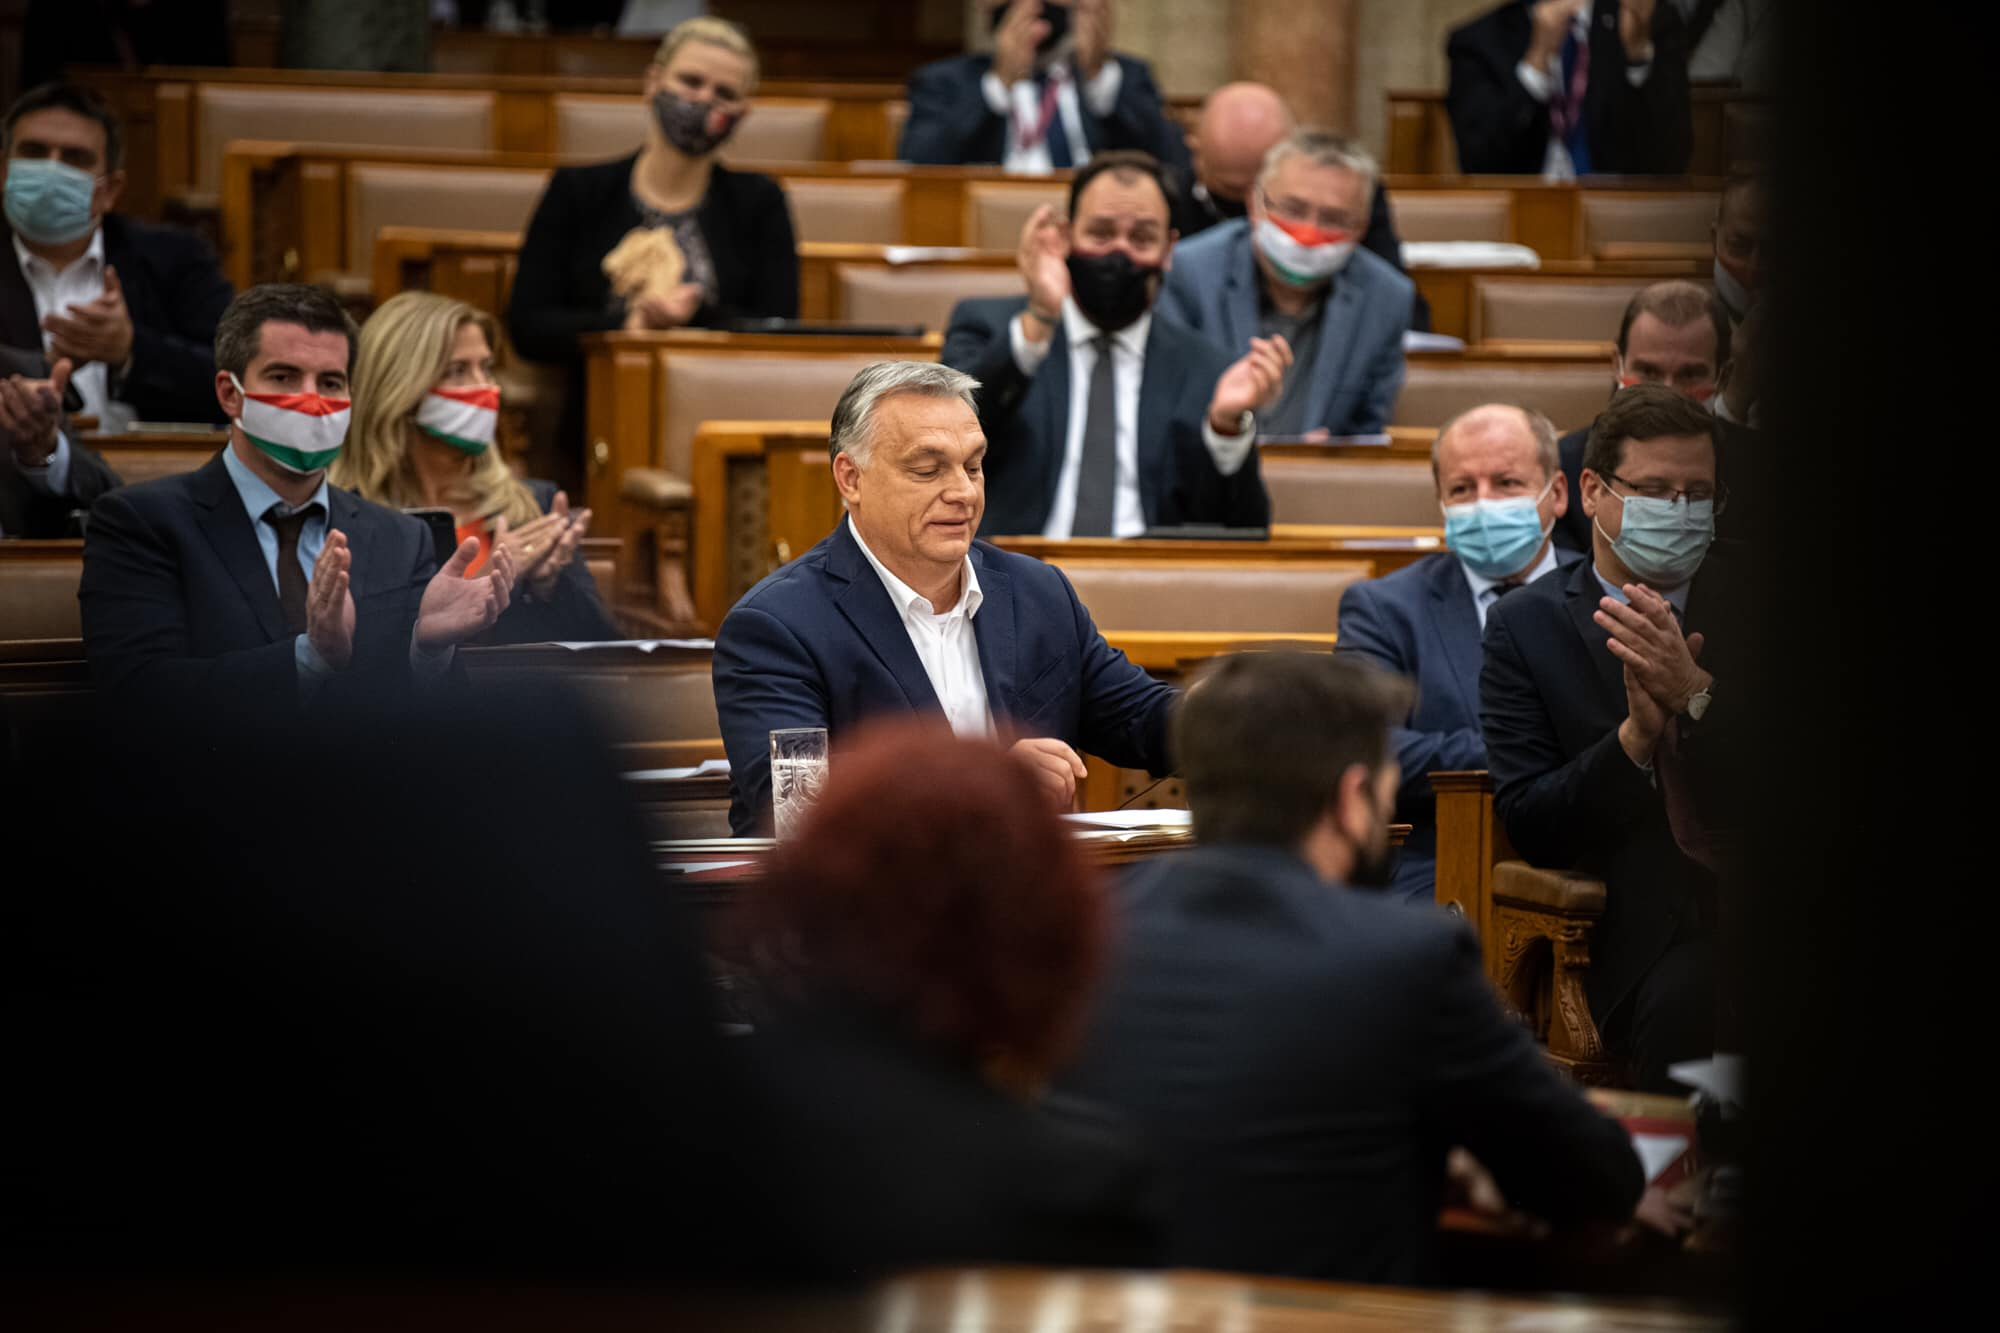 Budapost: Grundgesetznovelle passiert das Parlament